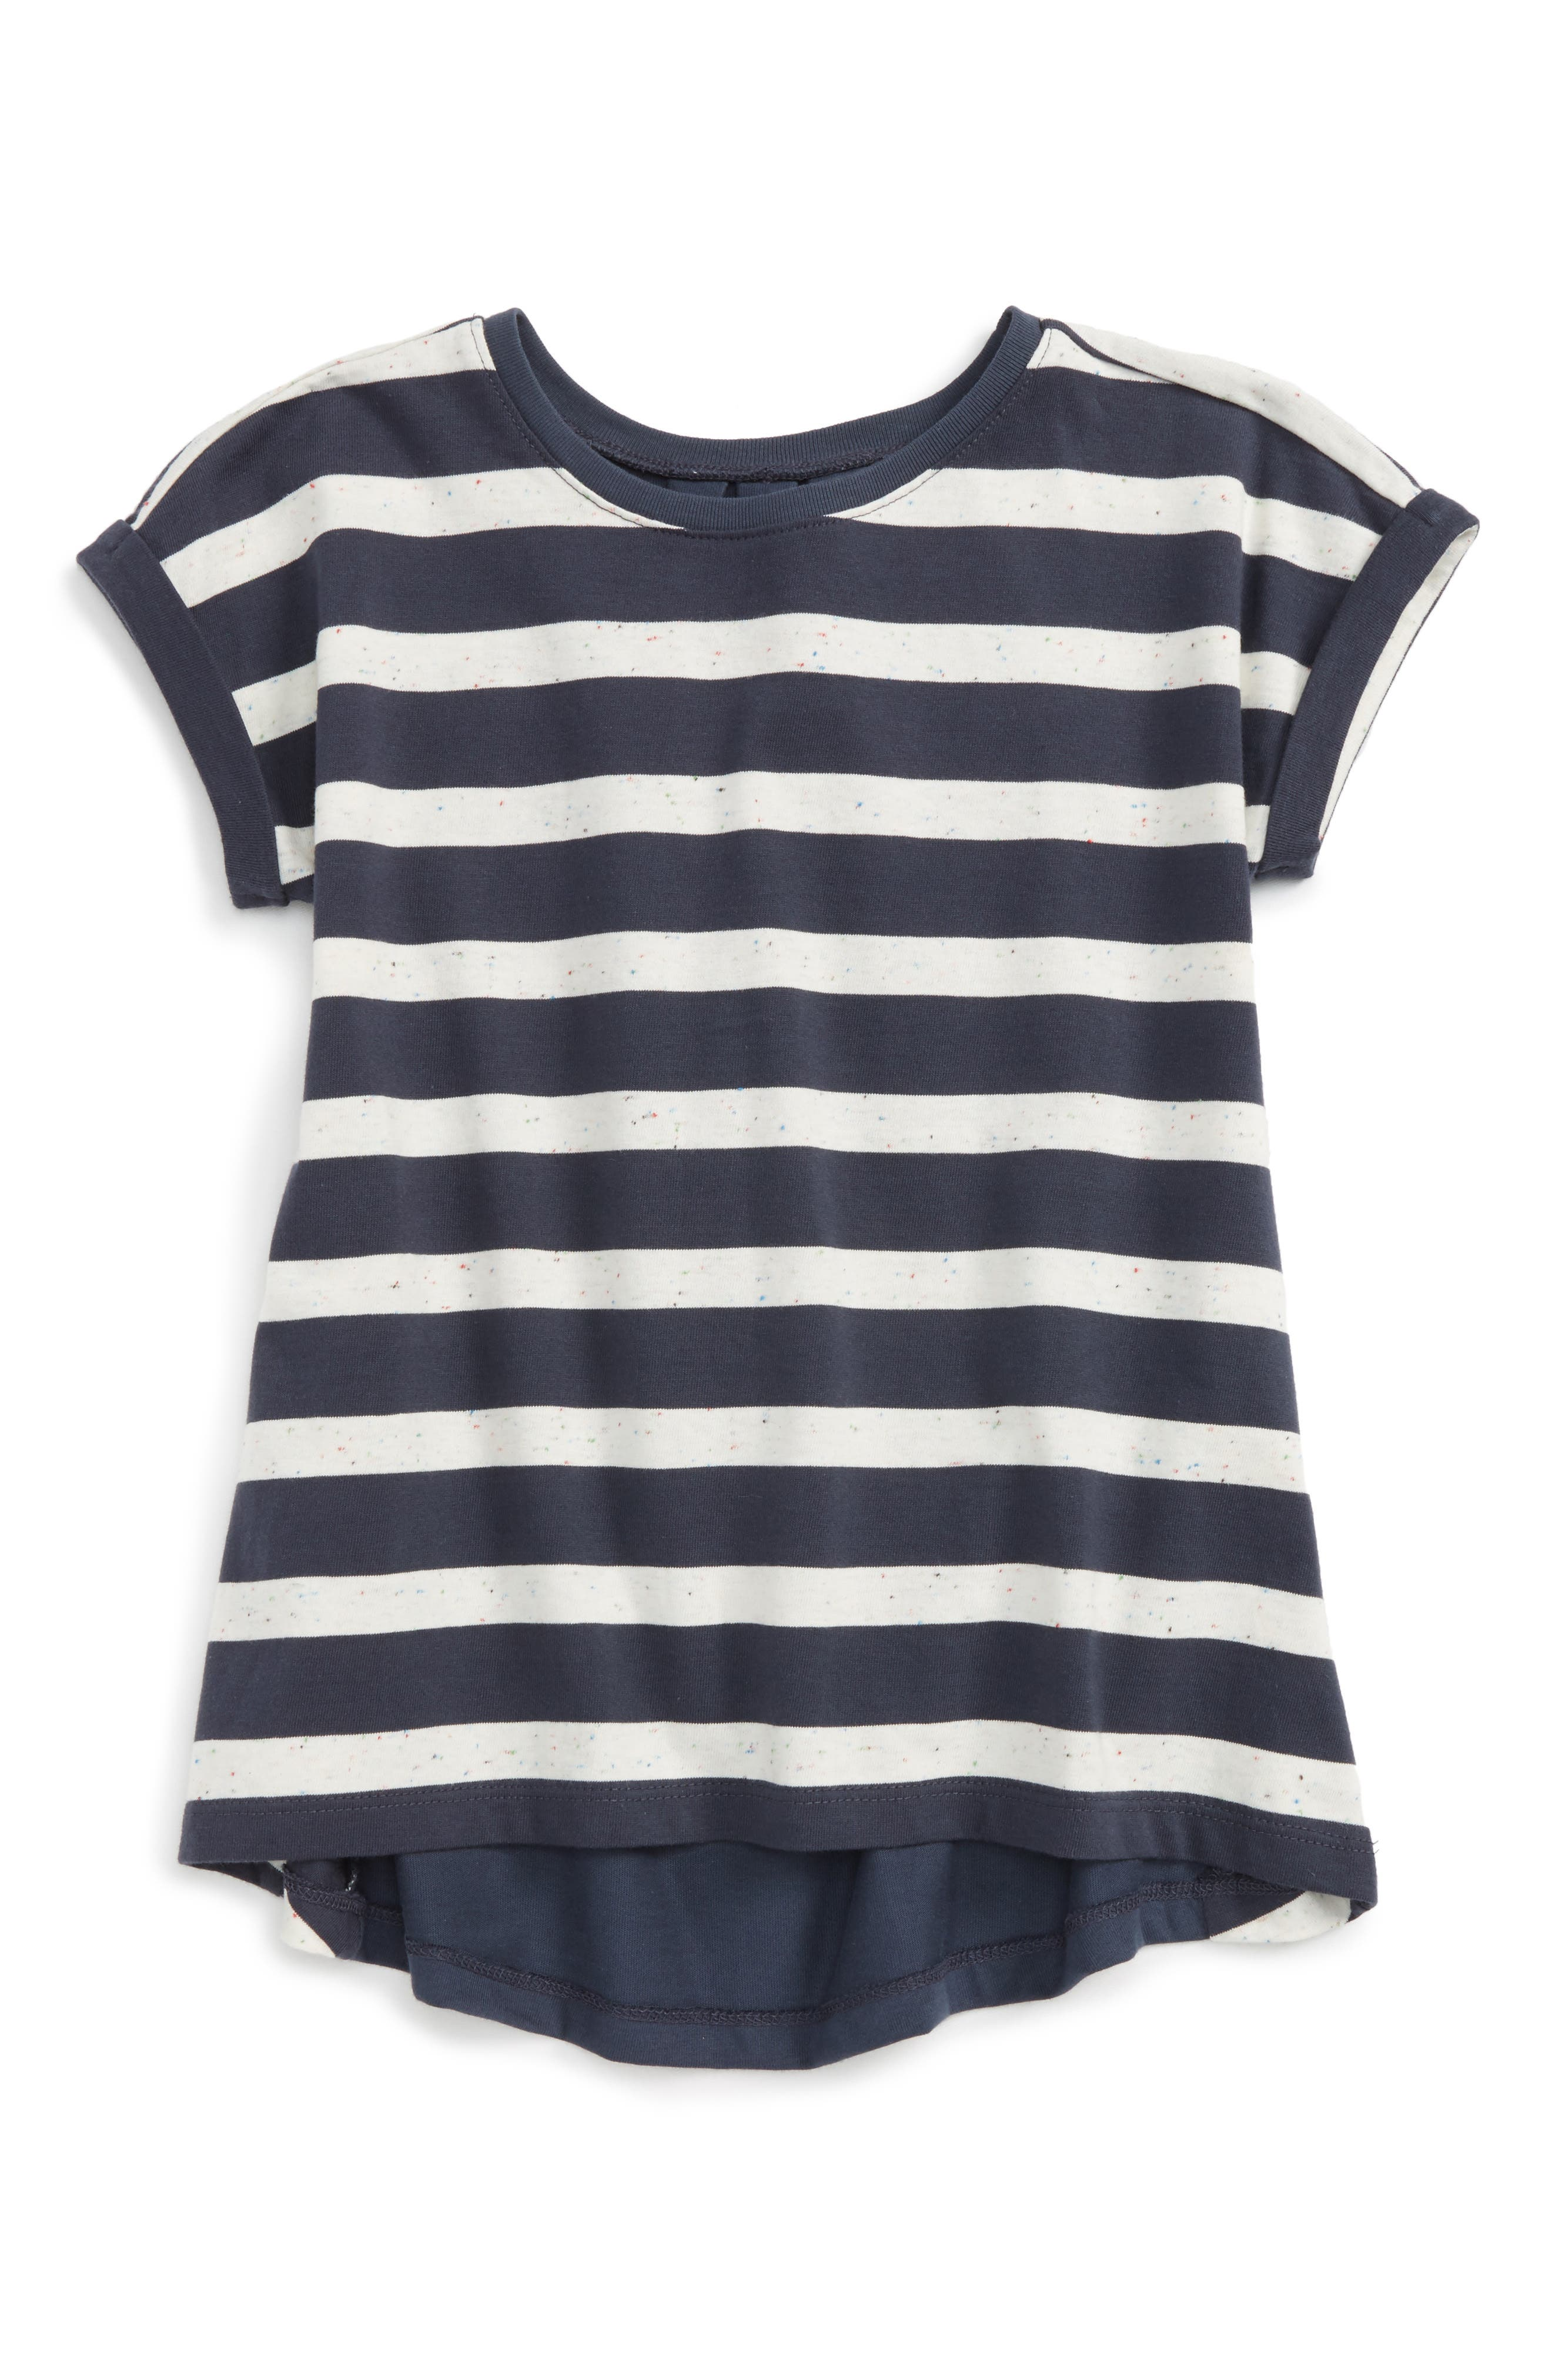 Alternate Image 1 Selected - Tea Collection Saorsa Pleated Top (Toddler Girls, Little Girls & Big Girls)